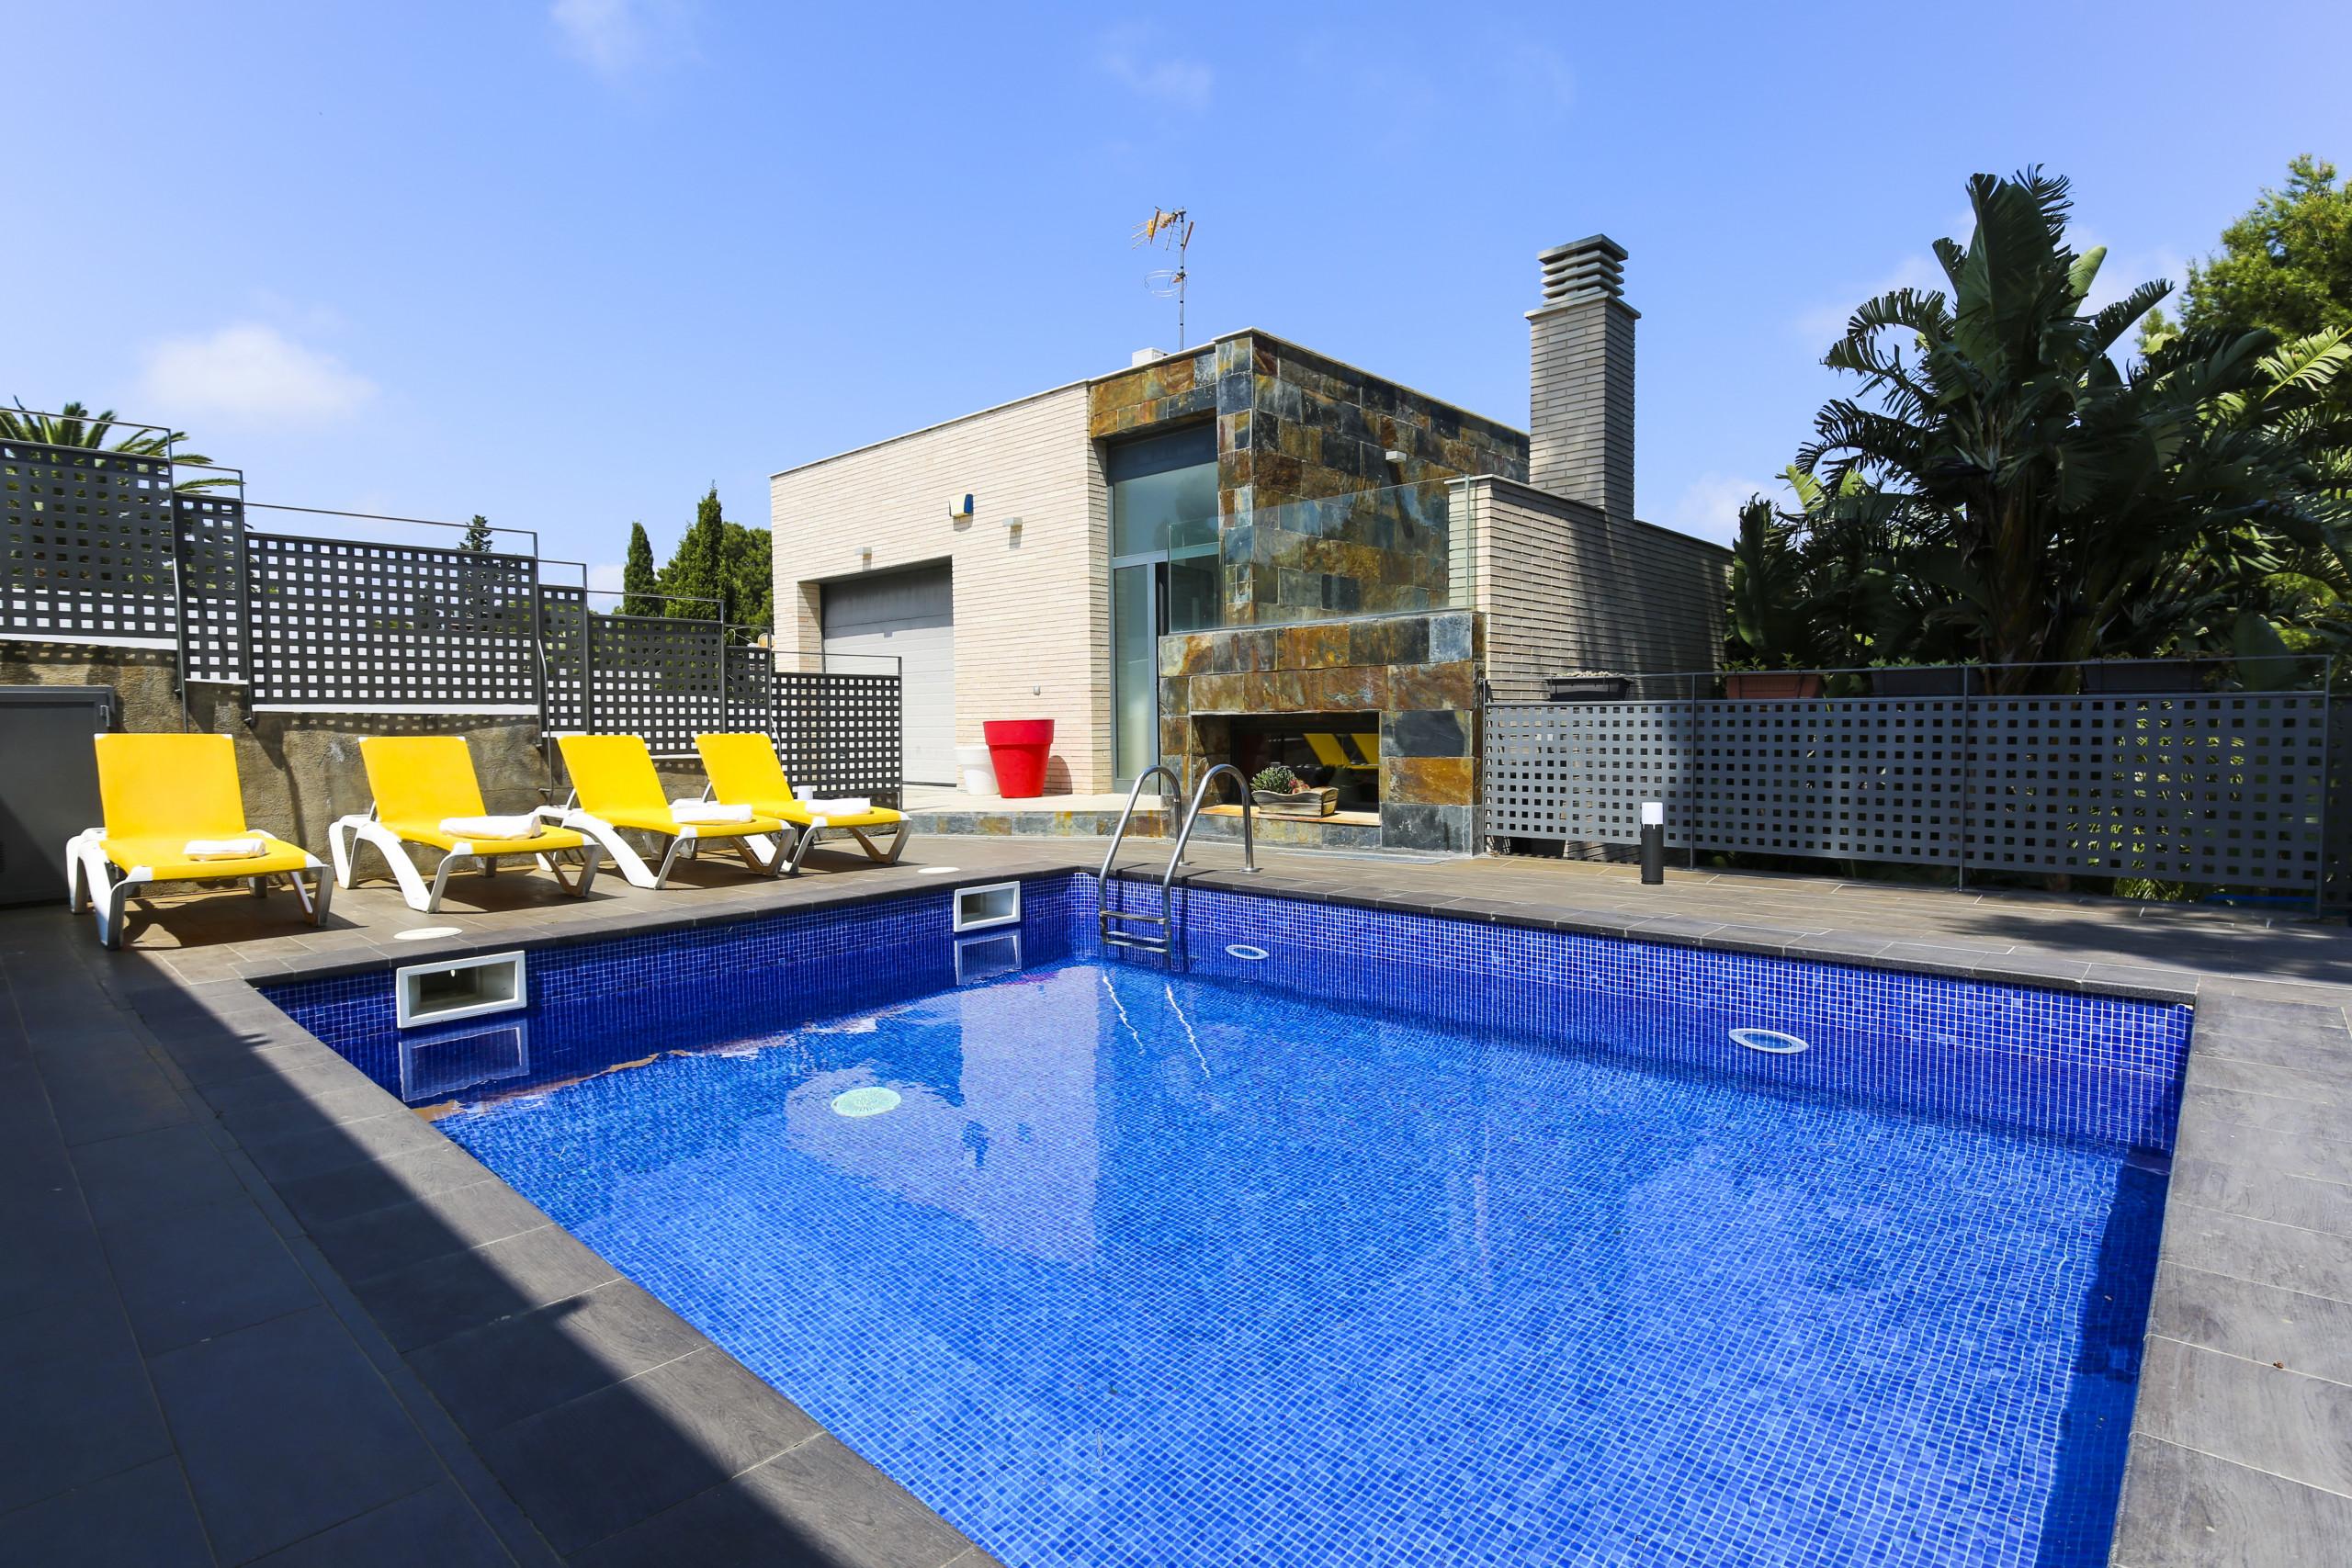 Location maison espagne salou avec piscine ventana blog - Maison location espagne avec piscine ...